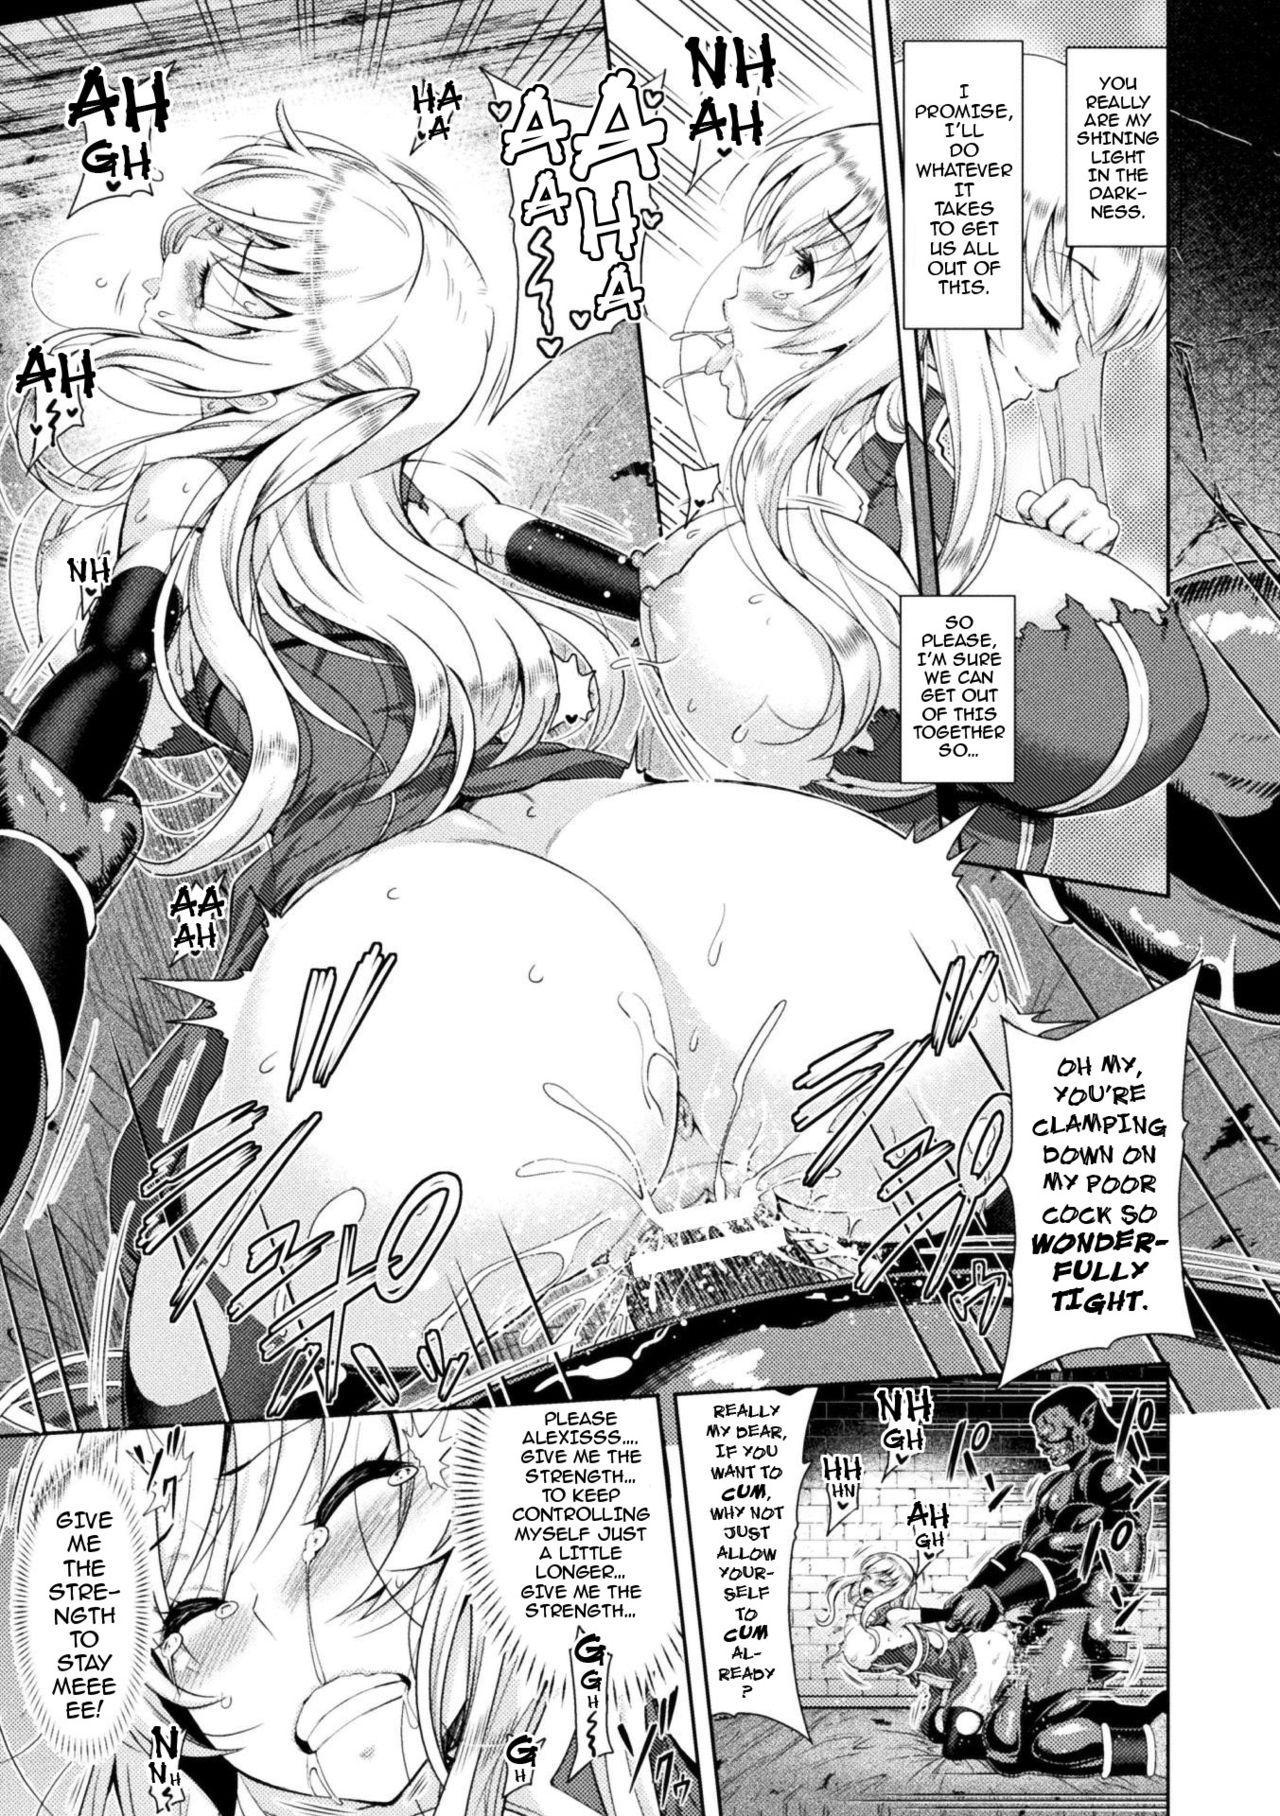 [Yamada Gogogo] Erona ~Orc no Inmon ni Okasareta Onna Kishi no Matsuro~   Erona ~The Fall of a Beautiful Knight Cursed with the Lewd Mark of an Orc~ Ch. 1-6 [English] {darknight} 35